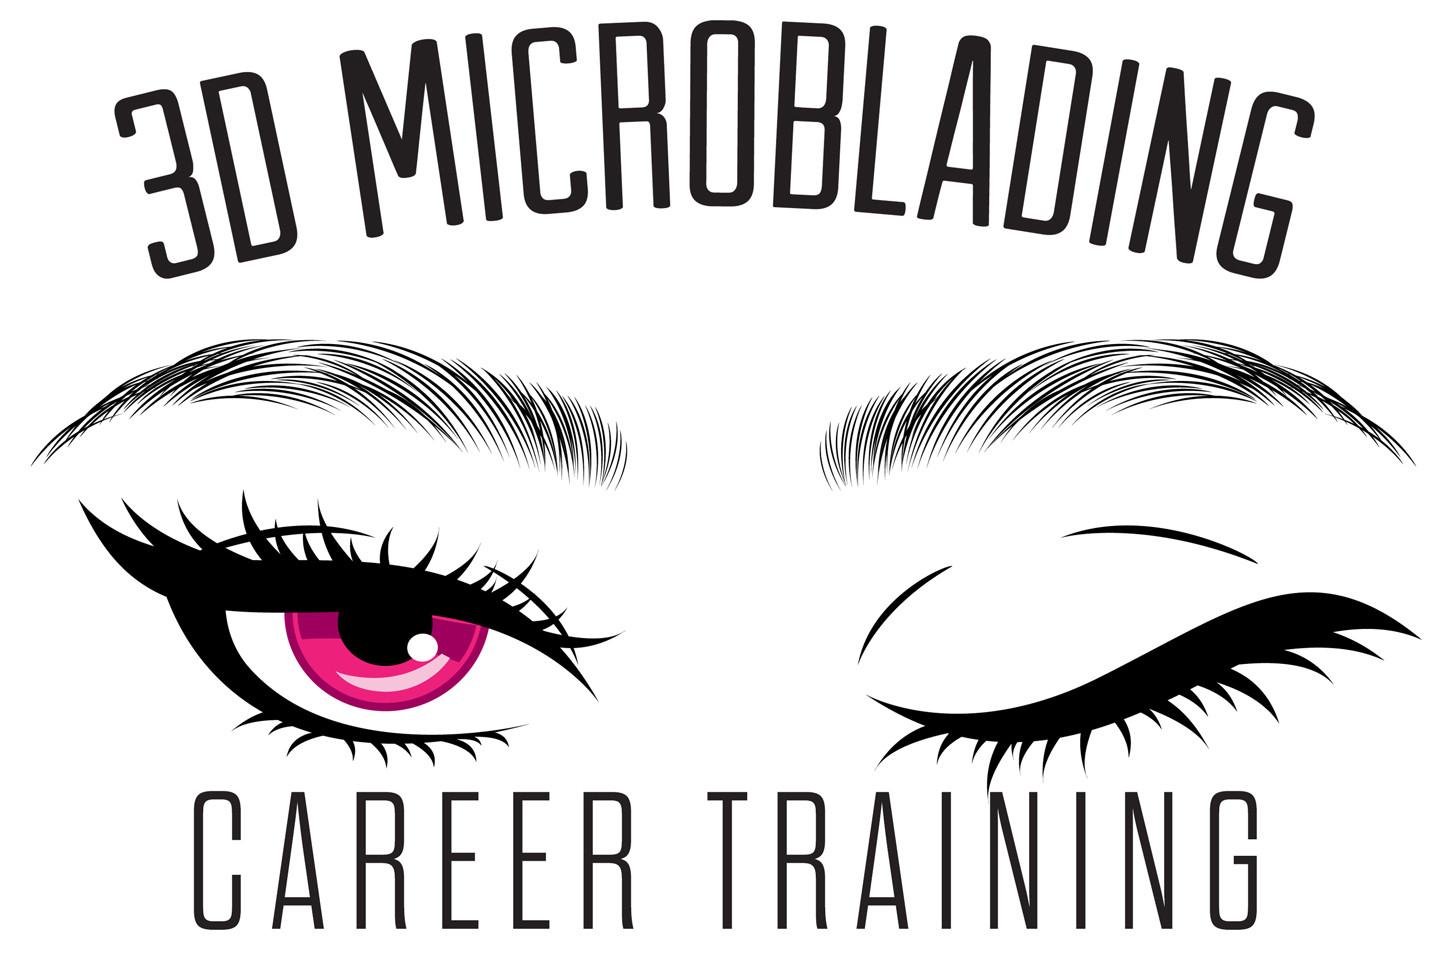 3D Microblading Training | FAQ